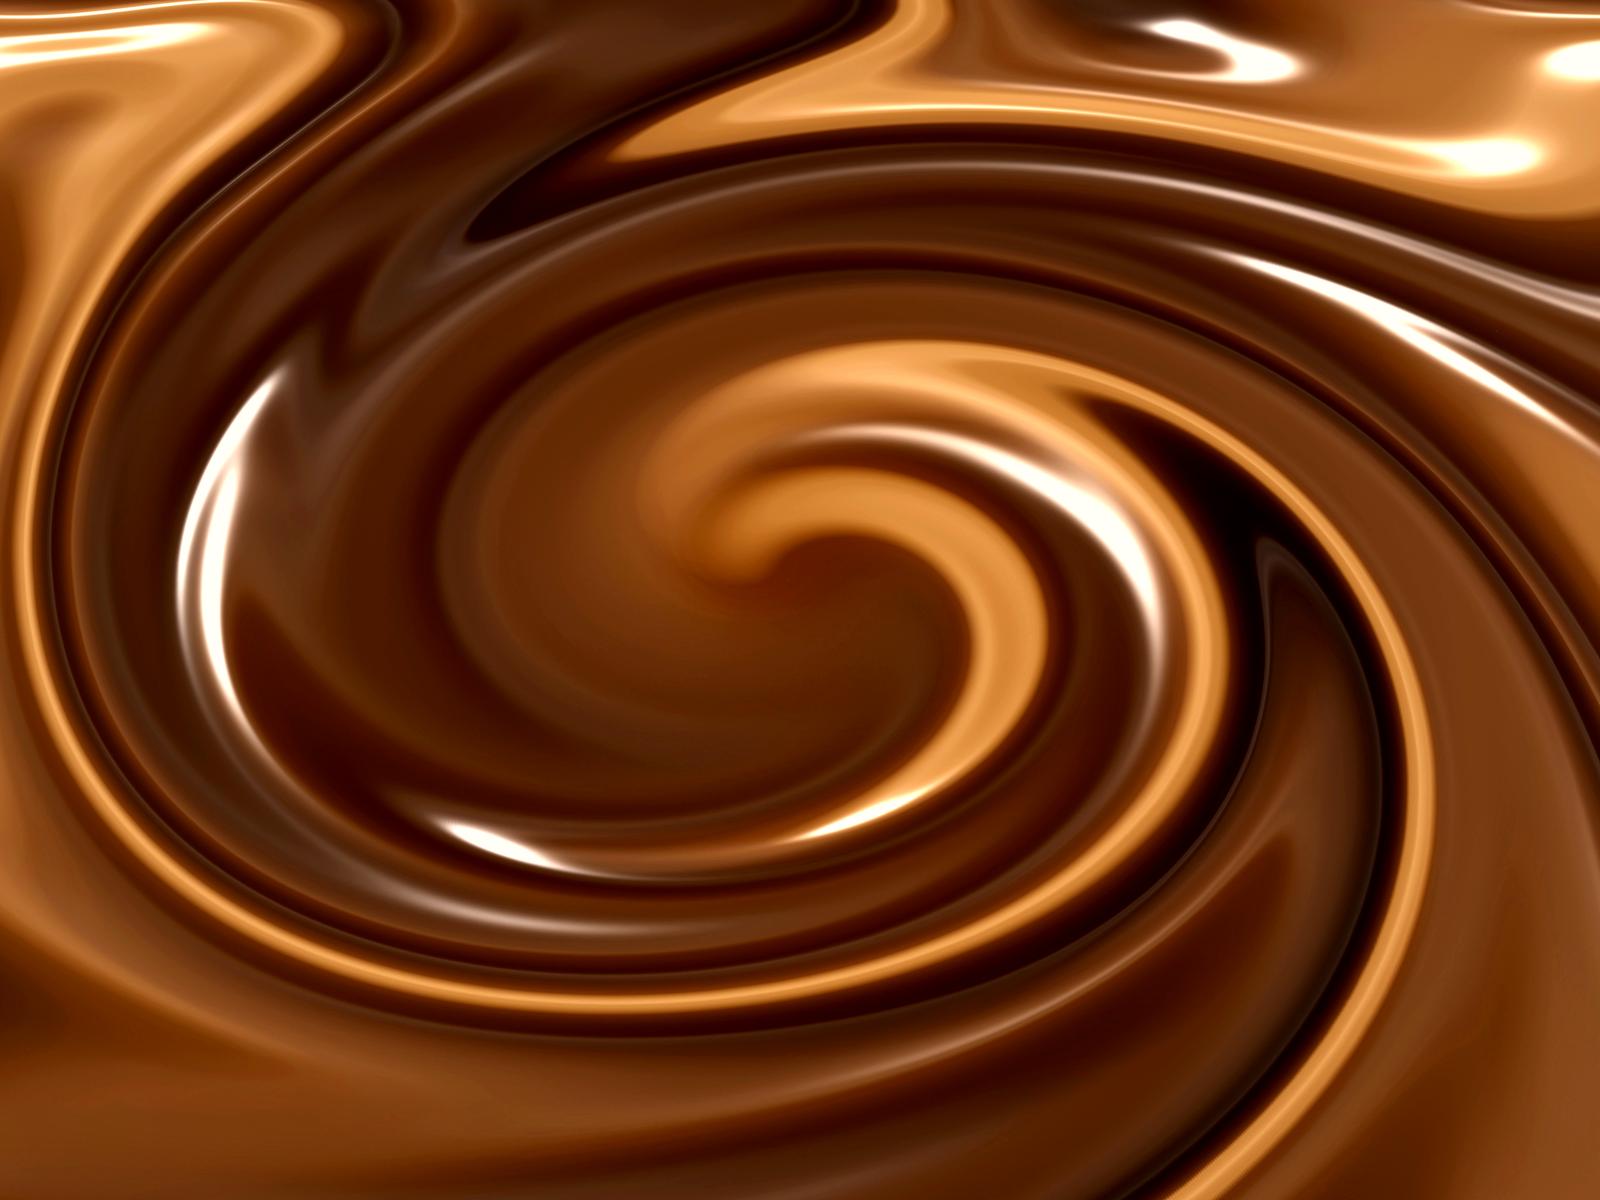 Chocolate wallpaper | 1600x1200 | #51987